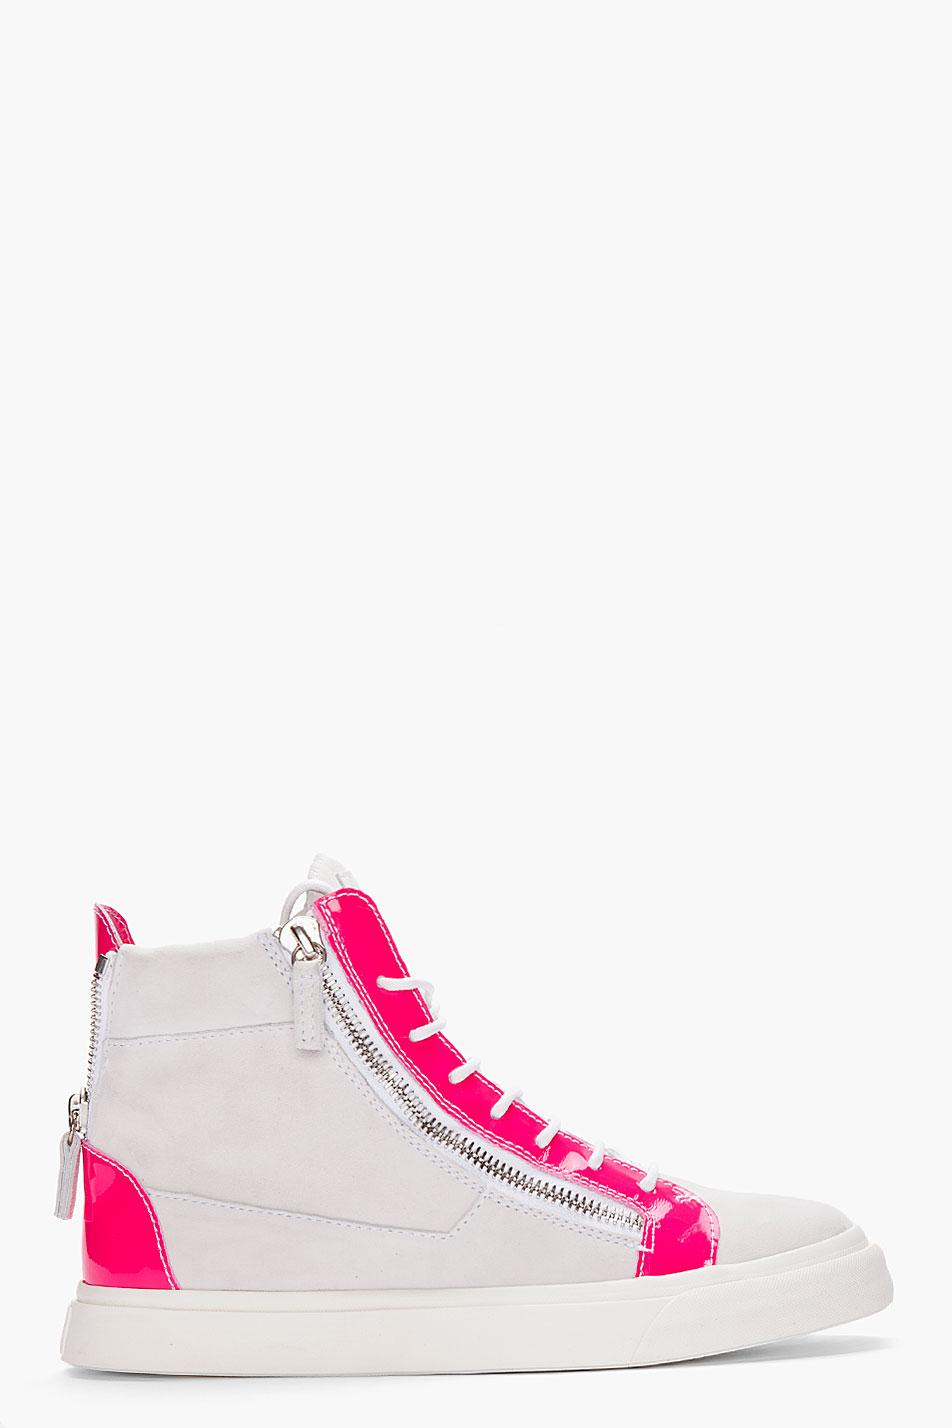 giuseppe zanotti grey and neon pink sneakers in